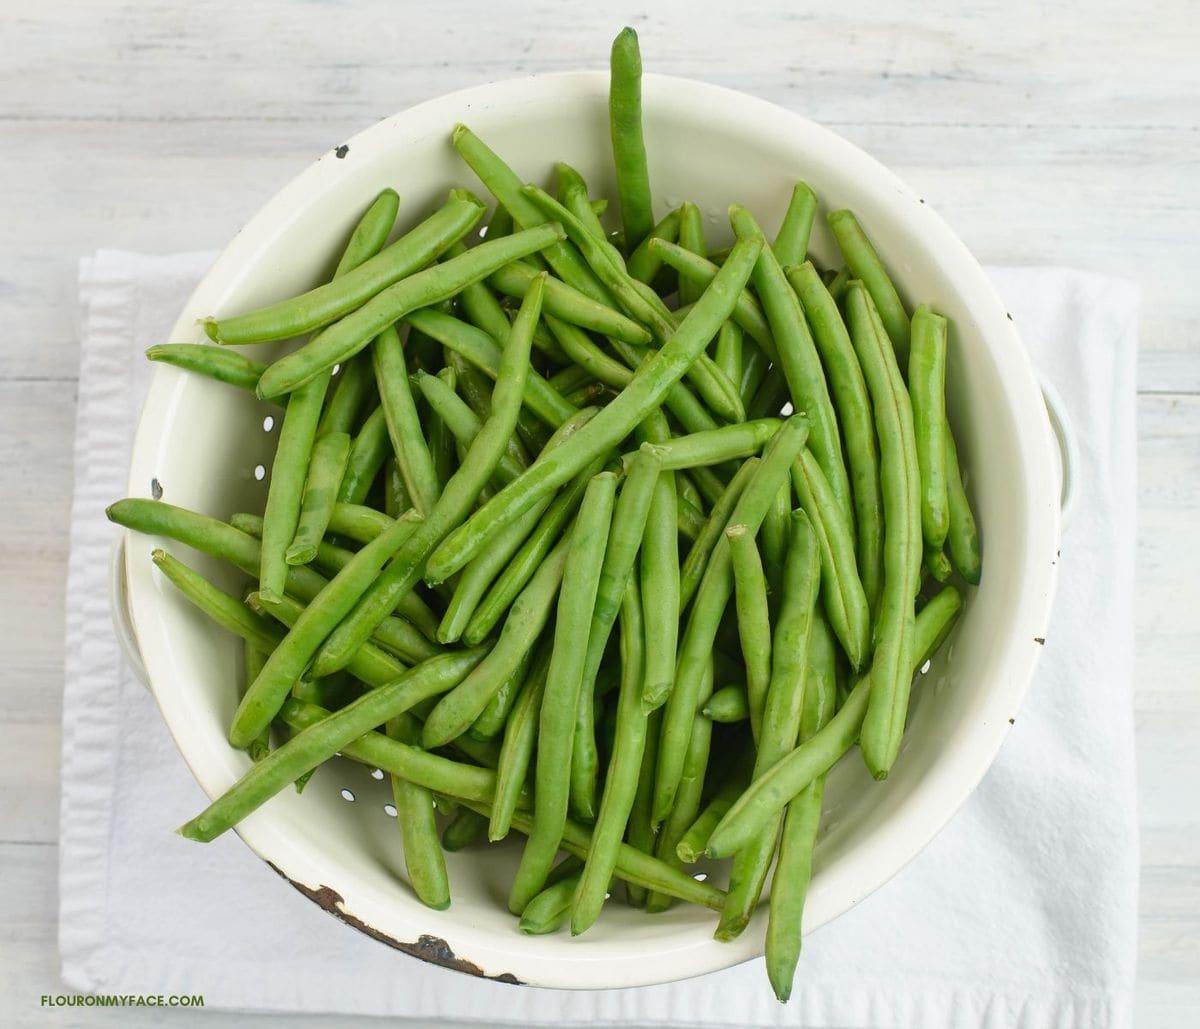 Fresh green beans in a white metal collander.